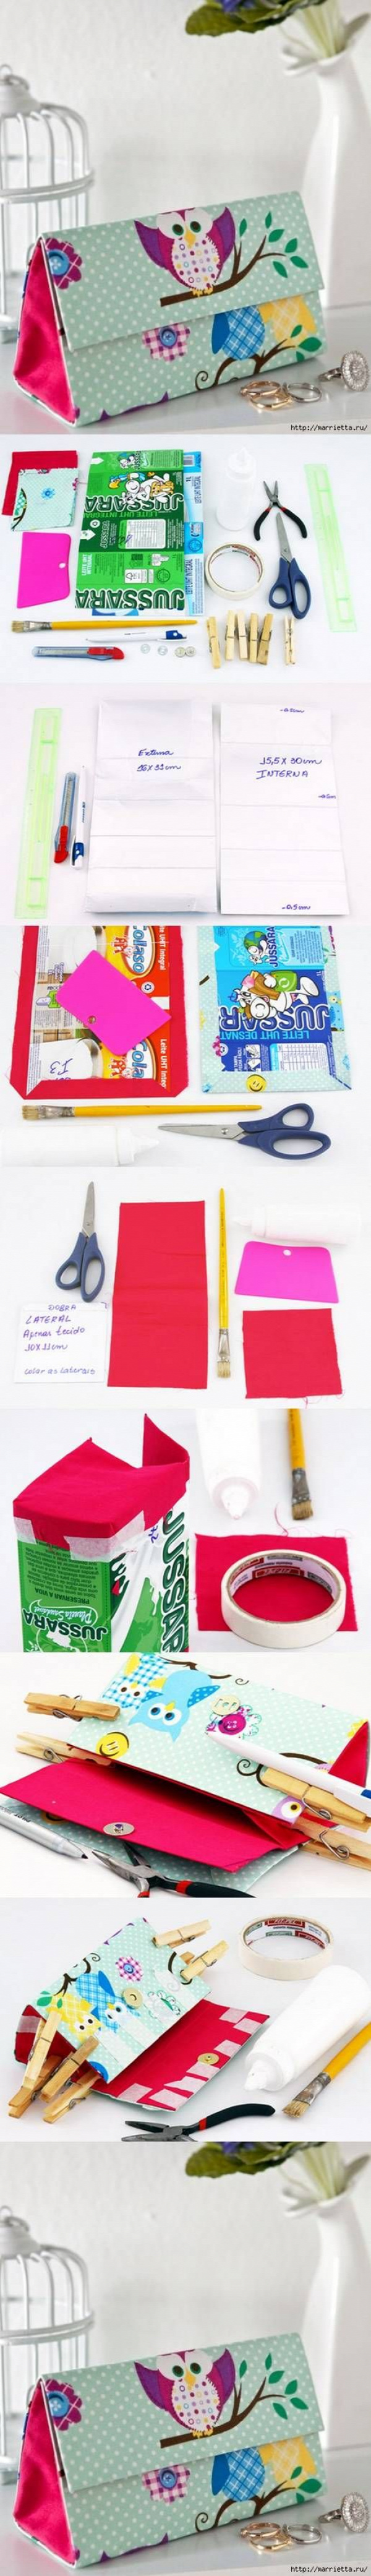 DIY Milk Box Clutch Handbag http://lv-outletonline.at.nr/       #lv bags#louis vuitton#bags $129.9-259.9!!Cheap !